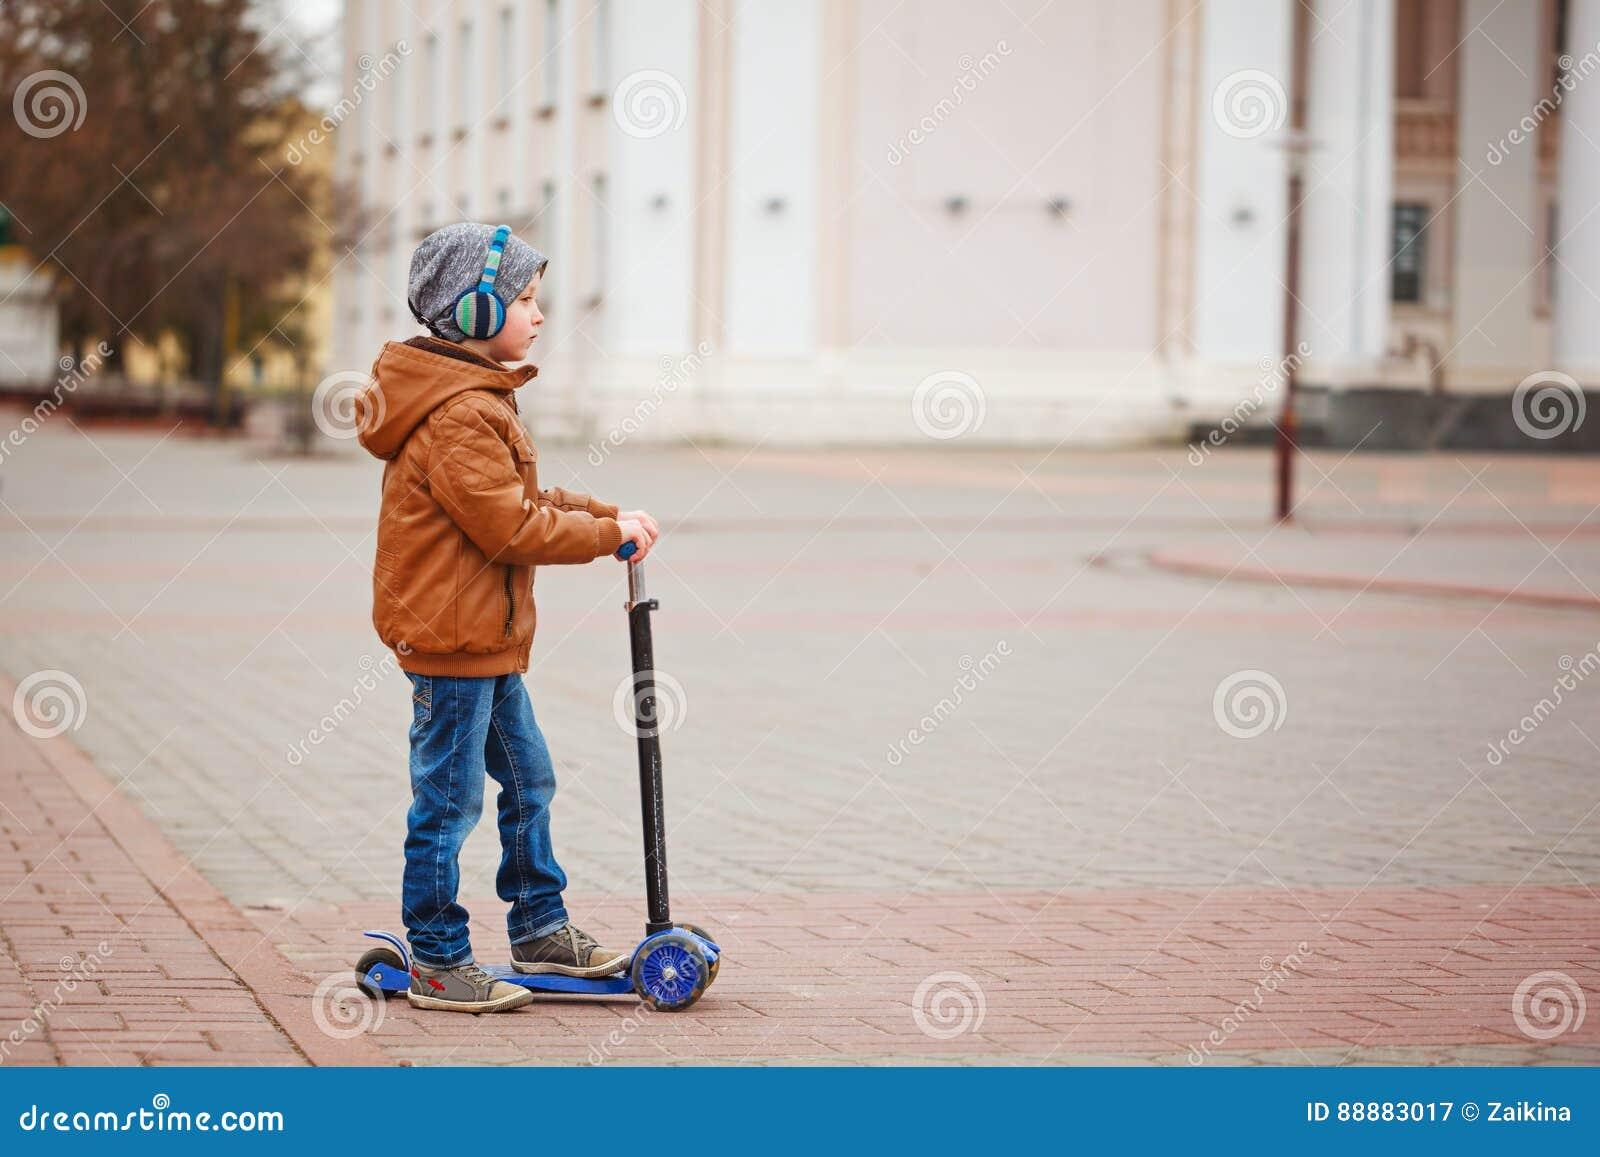 Cute Little Kid Boy Riding On Scooter Children Actitvities Outdoor